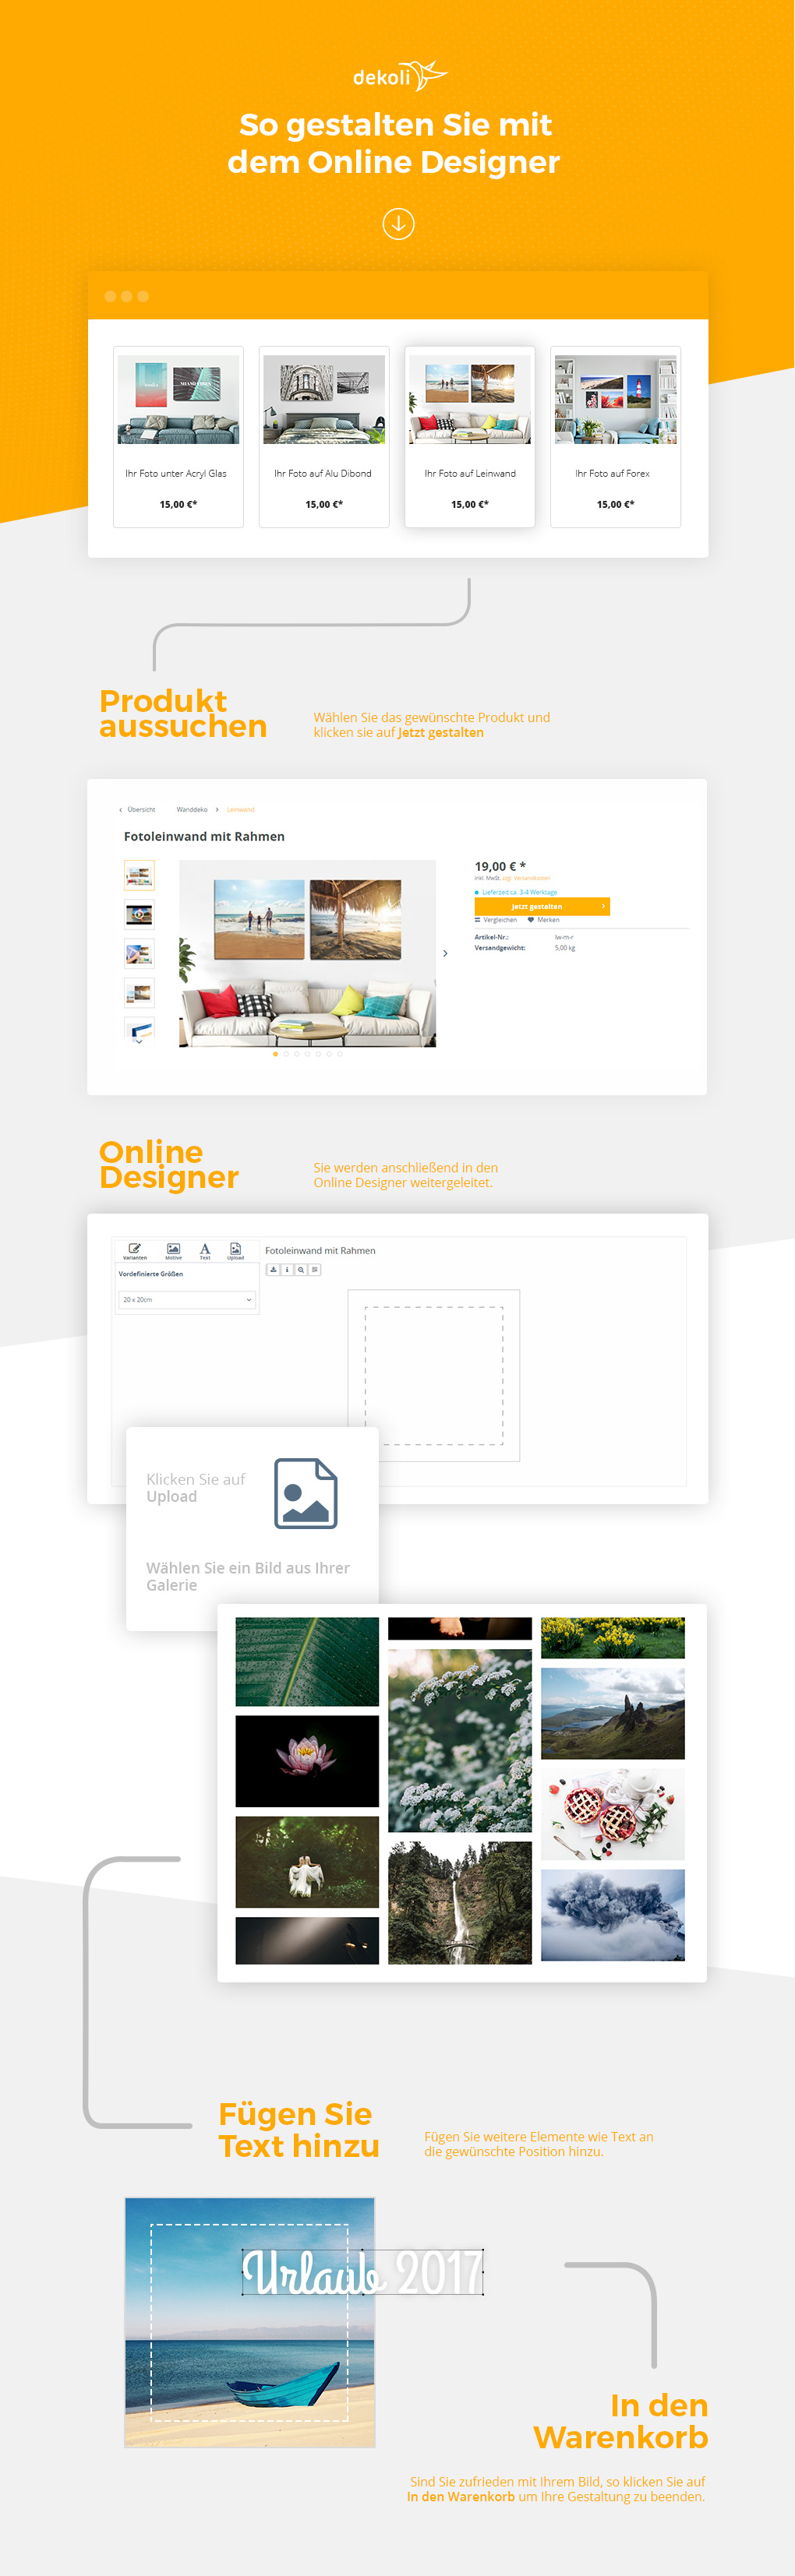 online_designer_dekoli_preview